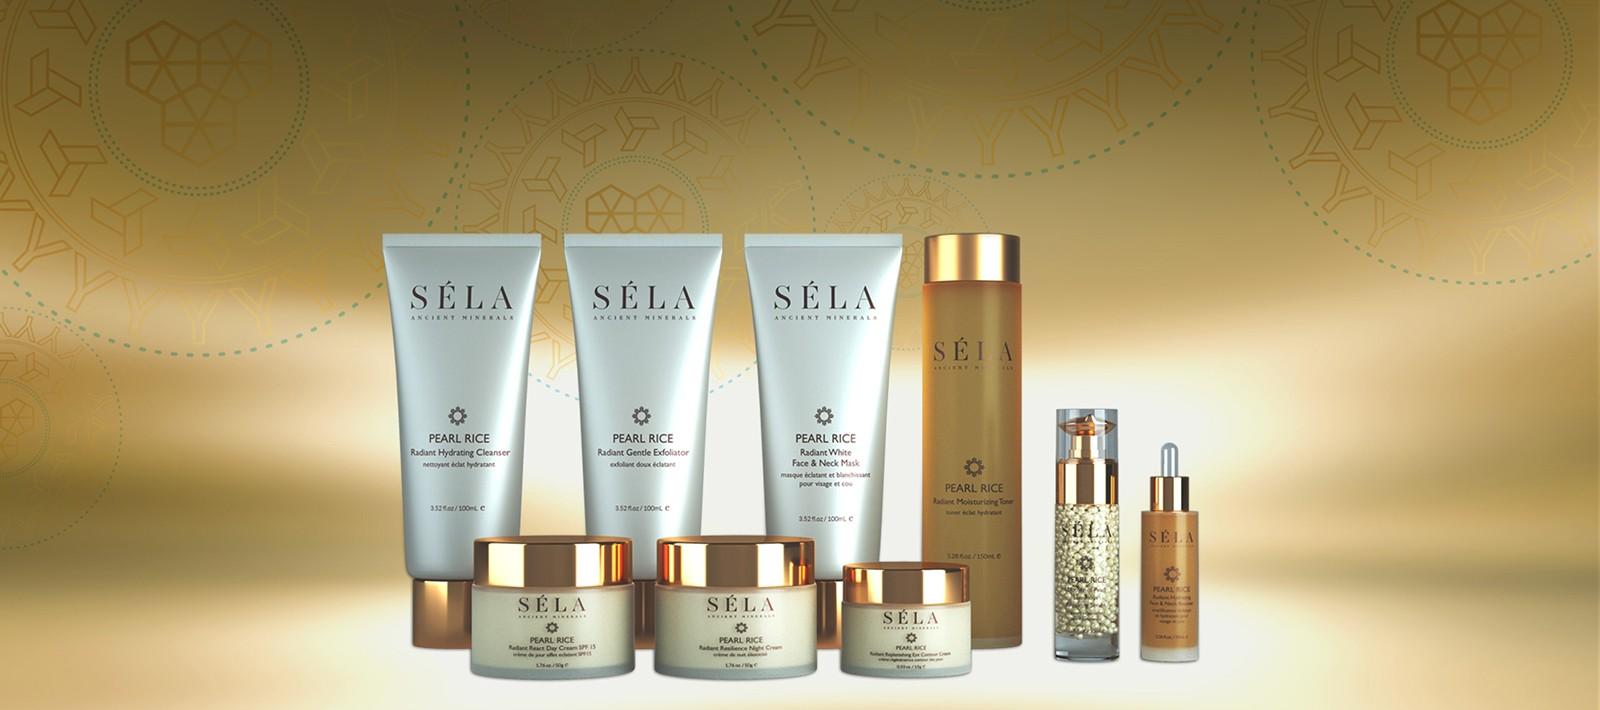 Sela skincare brand product design